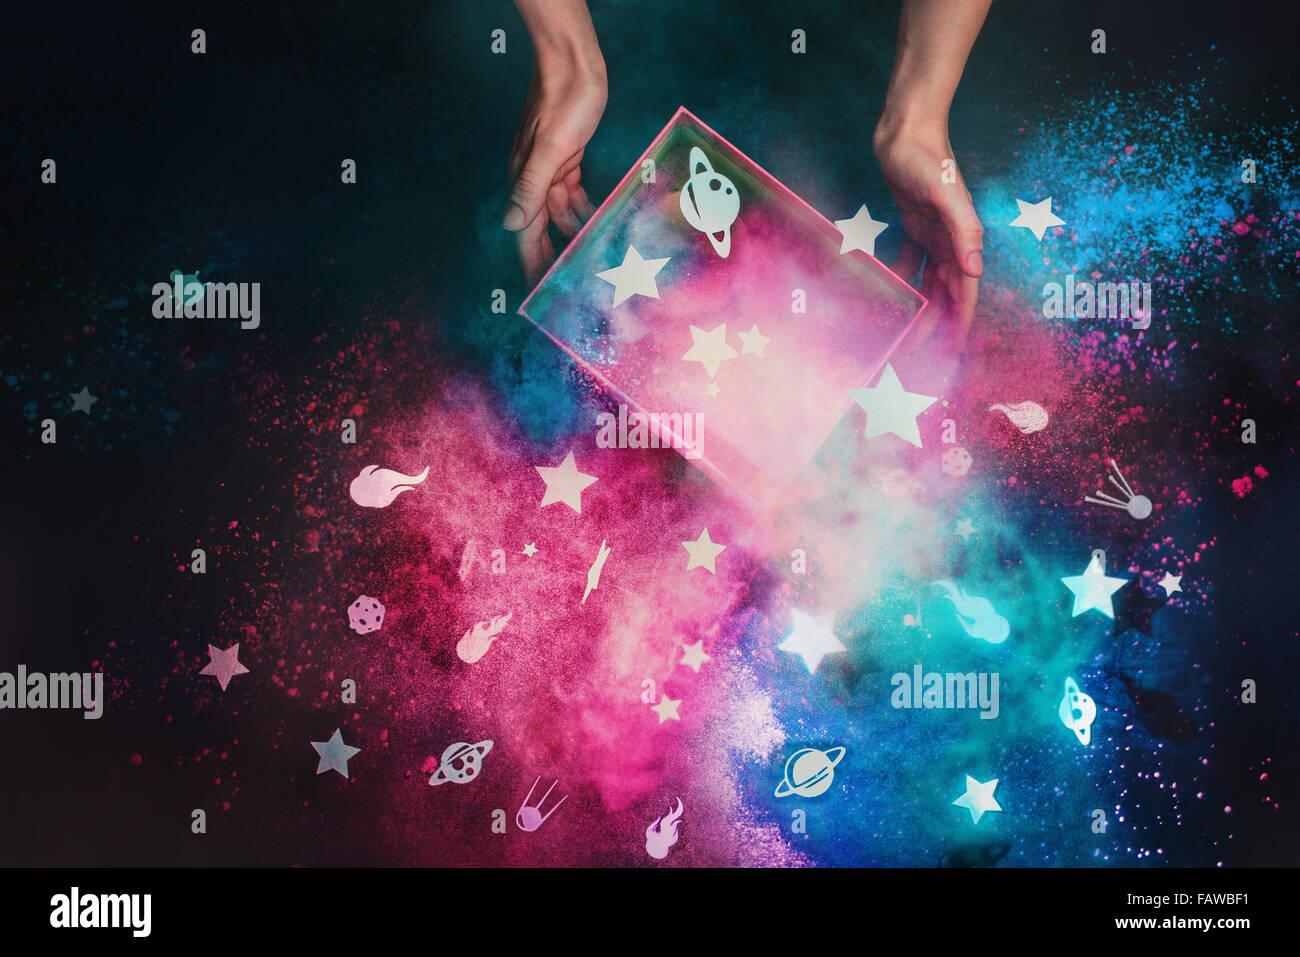 A box full of stars - Stock Image